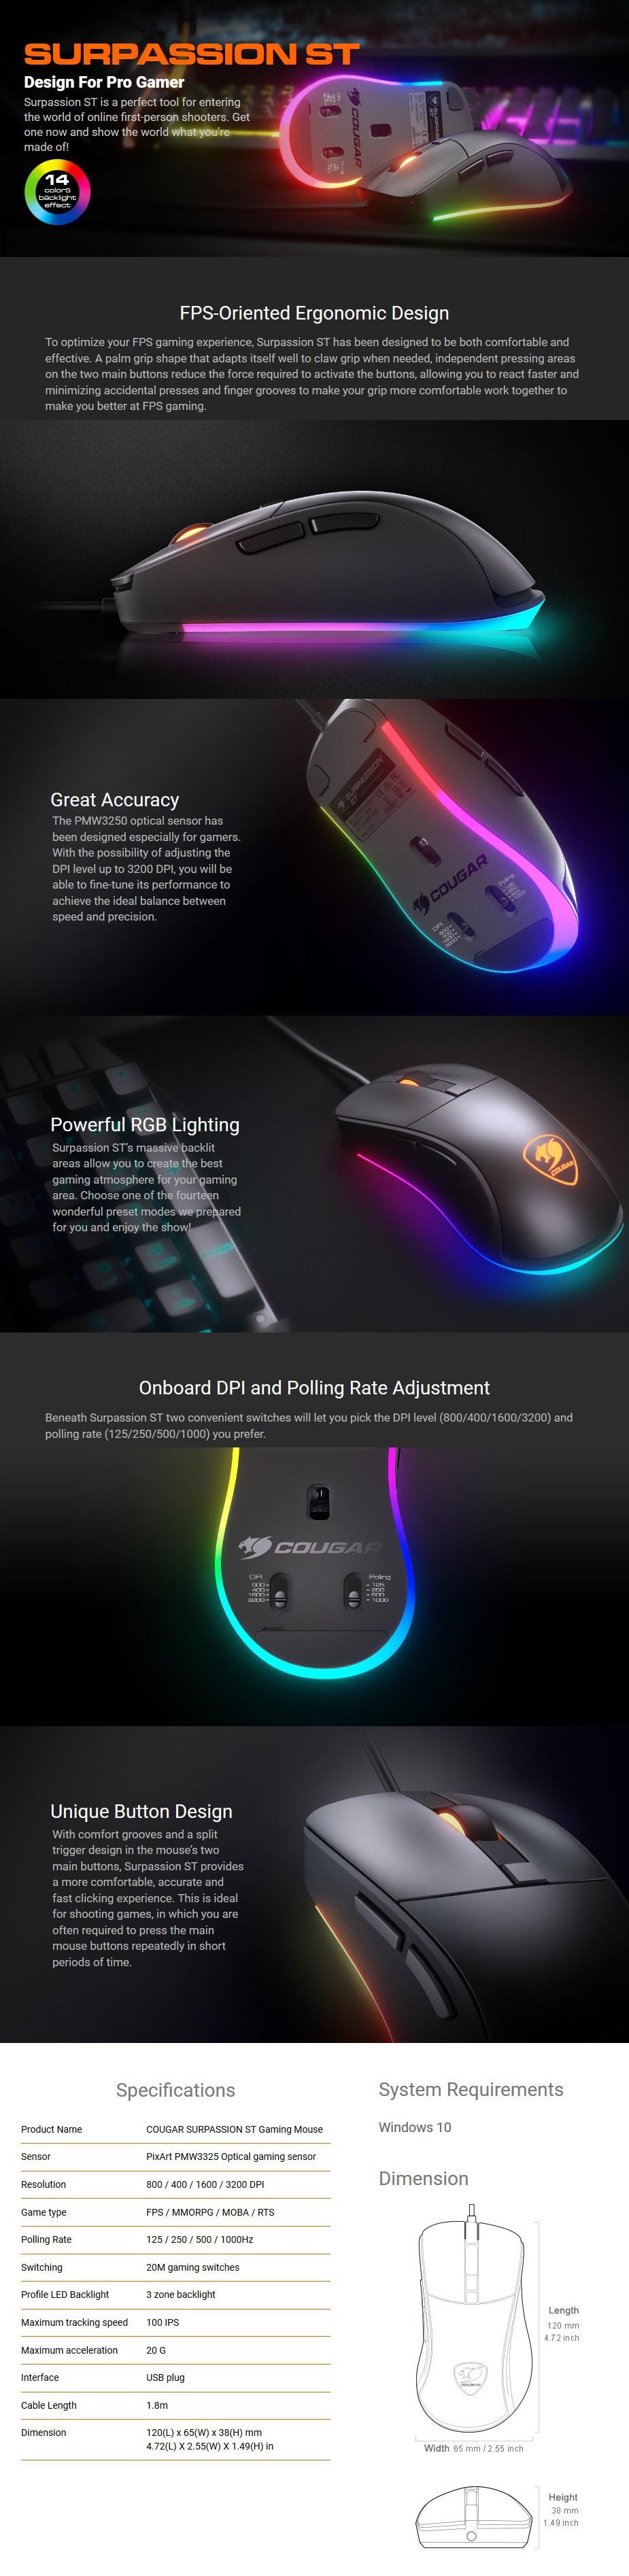 Cougar Surpassion ST RGB Optical Gaming Mouse - Desktop Overview 1